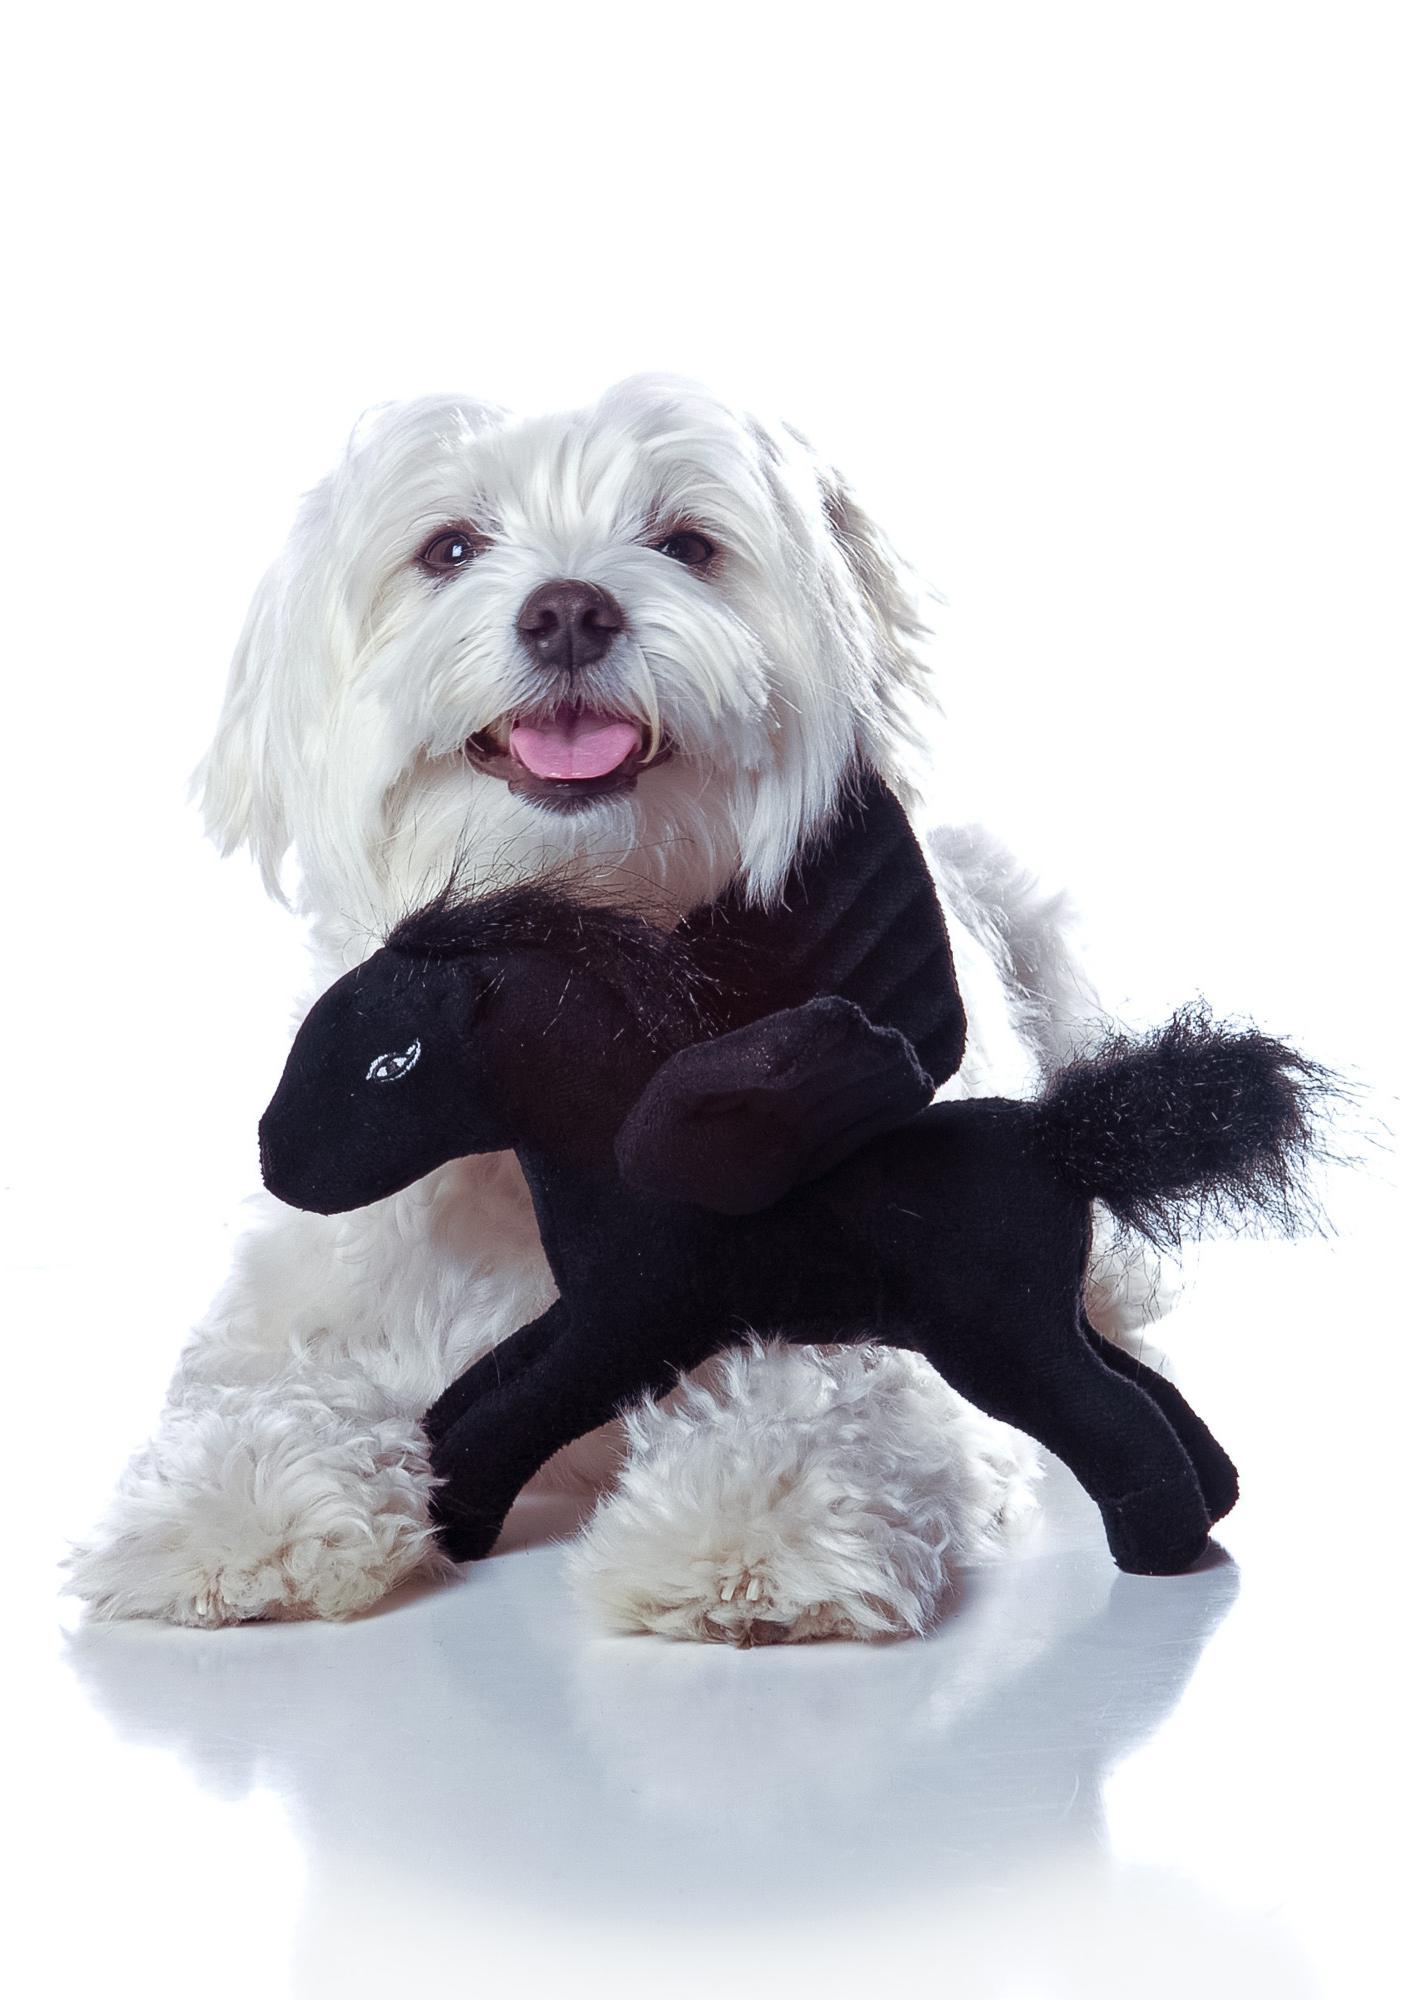 Pearl Pegasus Mighty Dog Toy Jr.